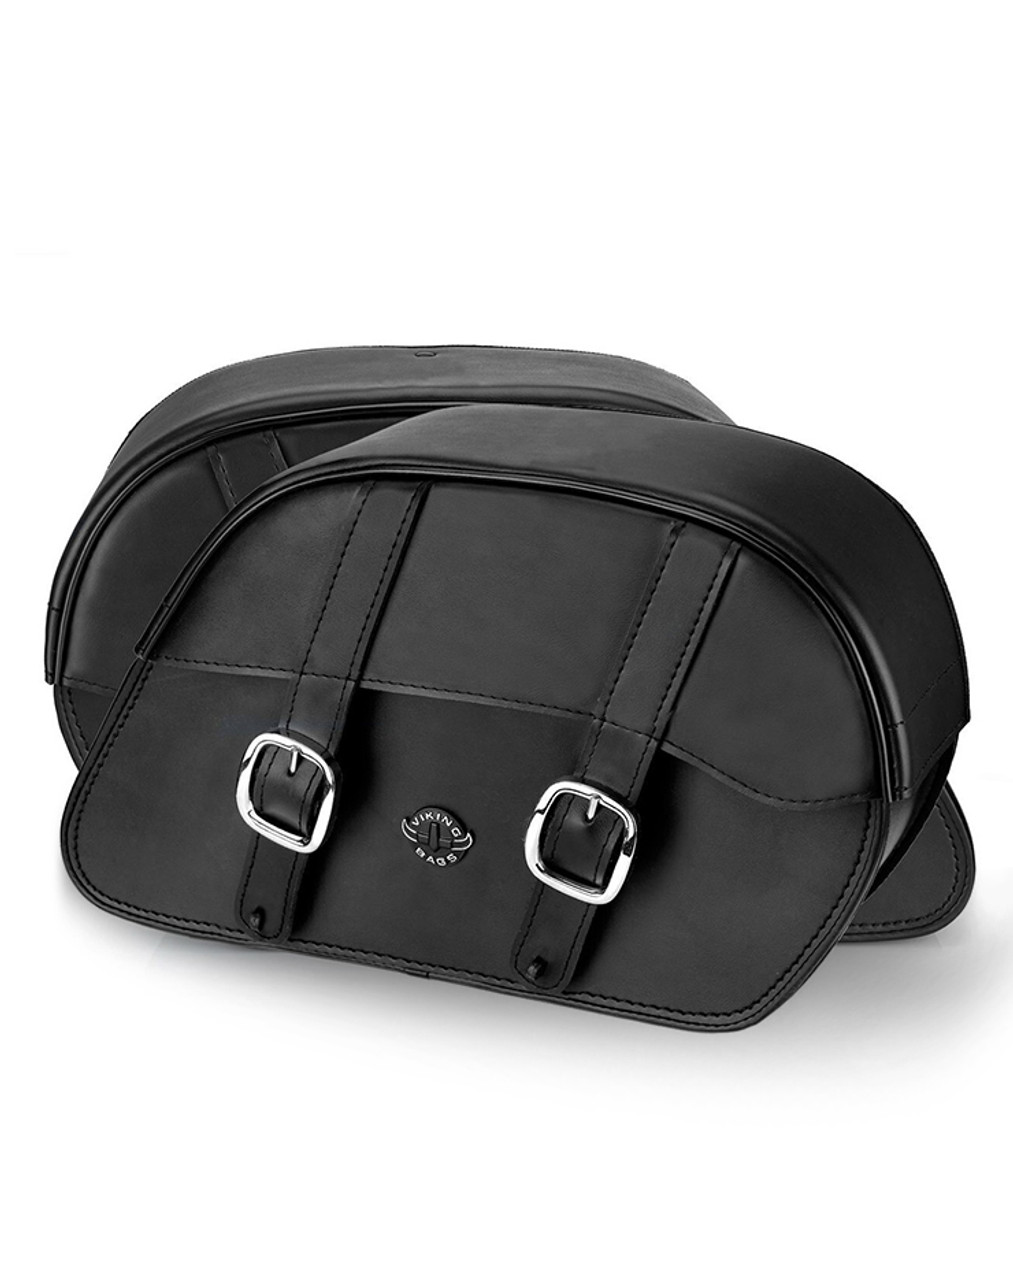 Indian Chief Standard Medium Plain Slanted Motorcycle Saddlebags Both Bags View